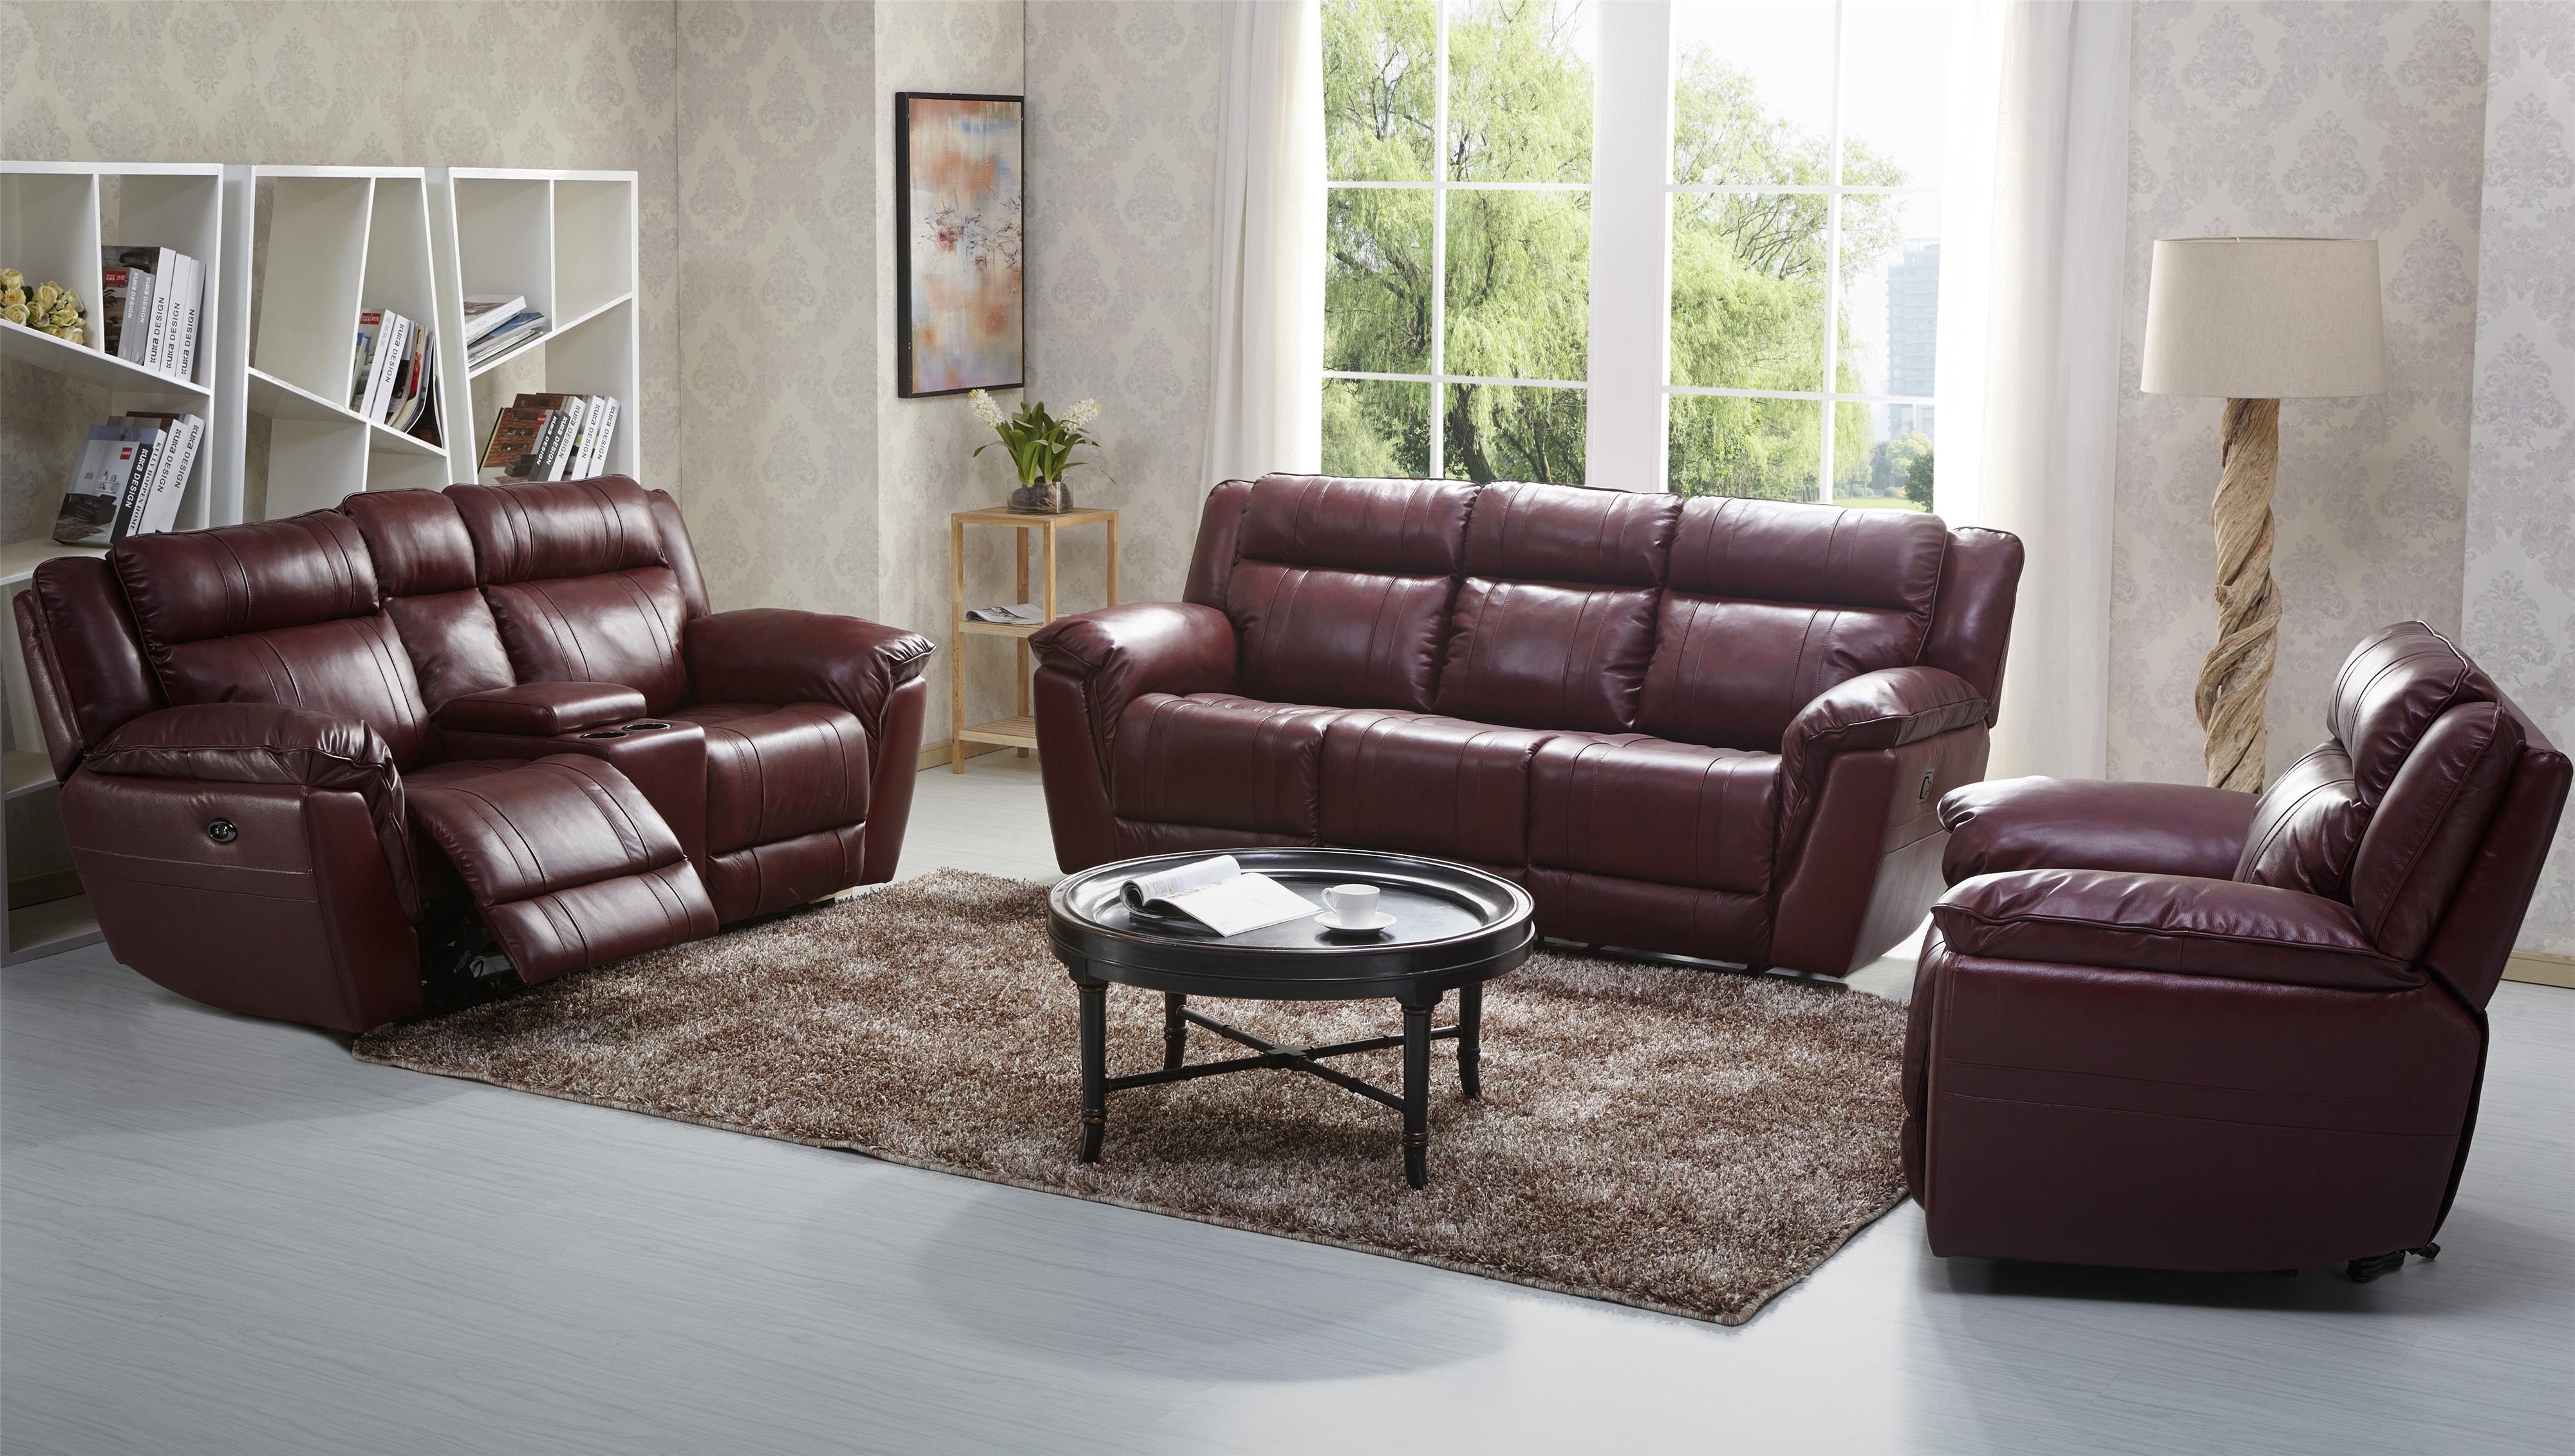 Kuka Home 1751 Reclining Love Seat Wilson s Furniture